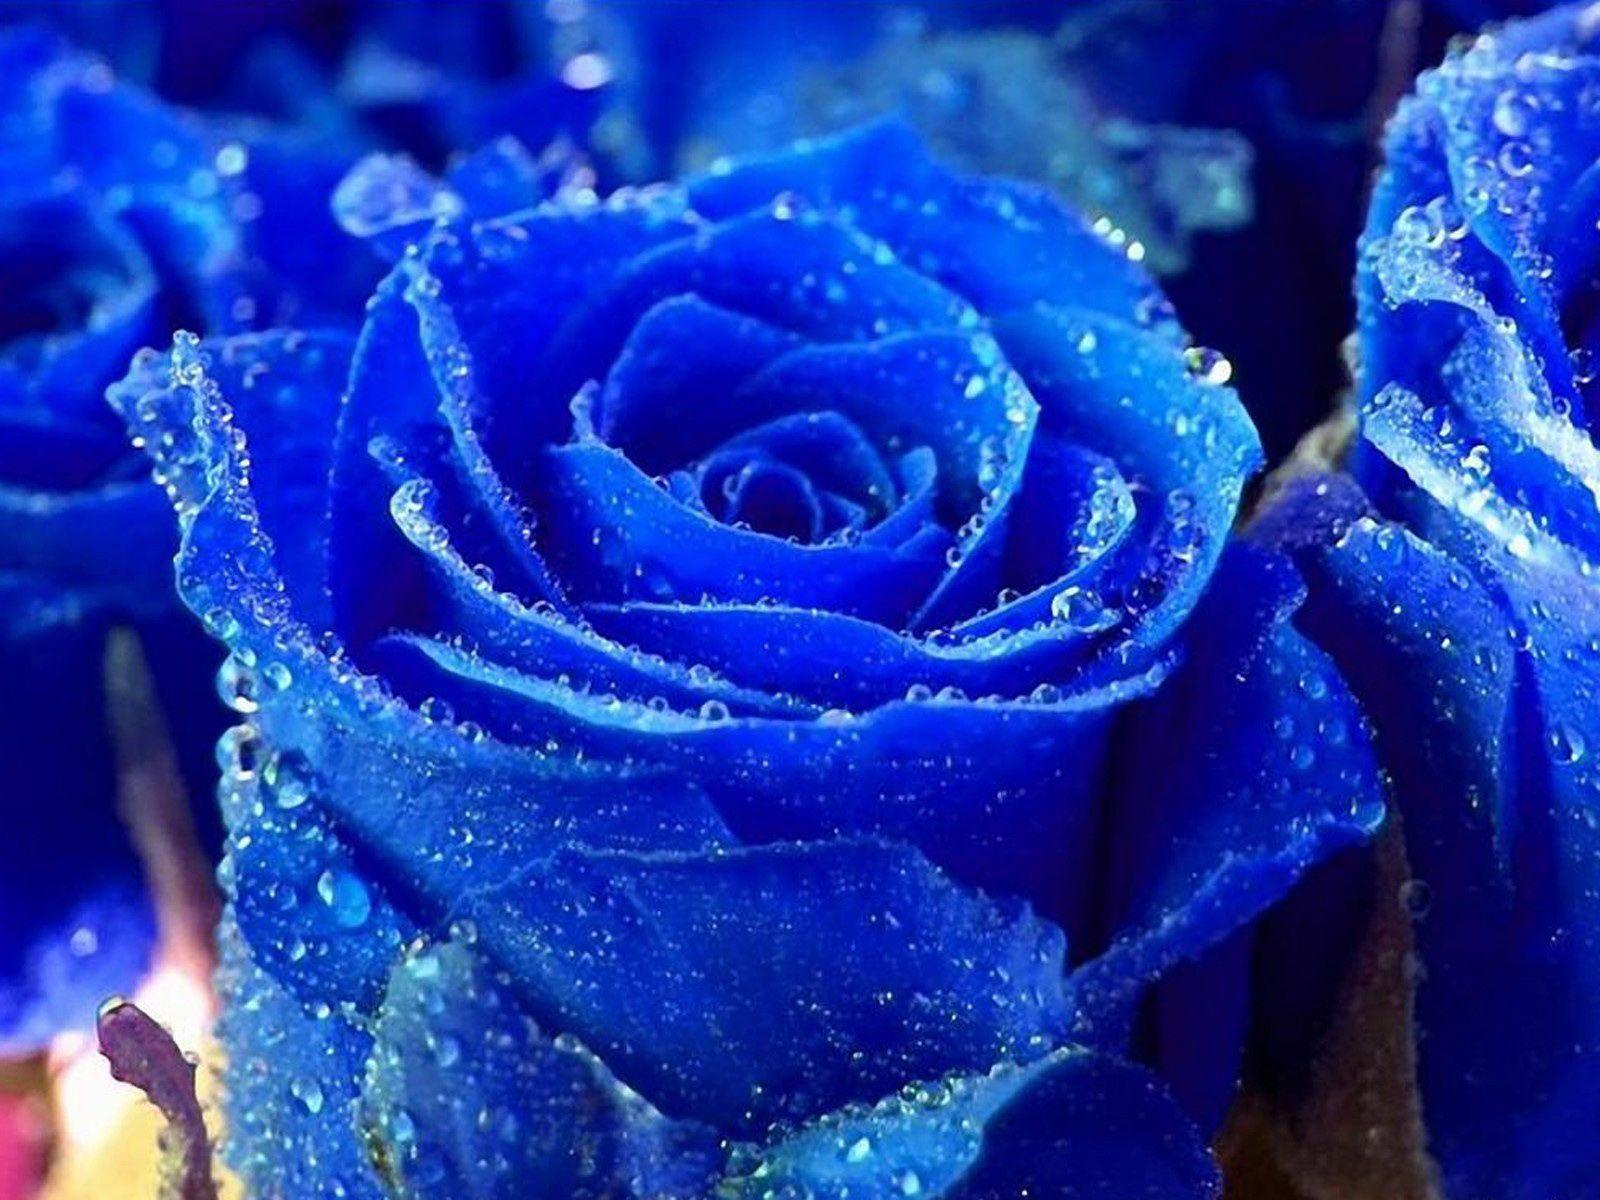 les plus beau fond ecran fleurs fond ecran pc 1600 1200 rose pinterest fond ecran fleur. Black Bedroom Furniture Sets. Home Design Ideas